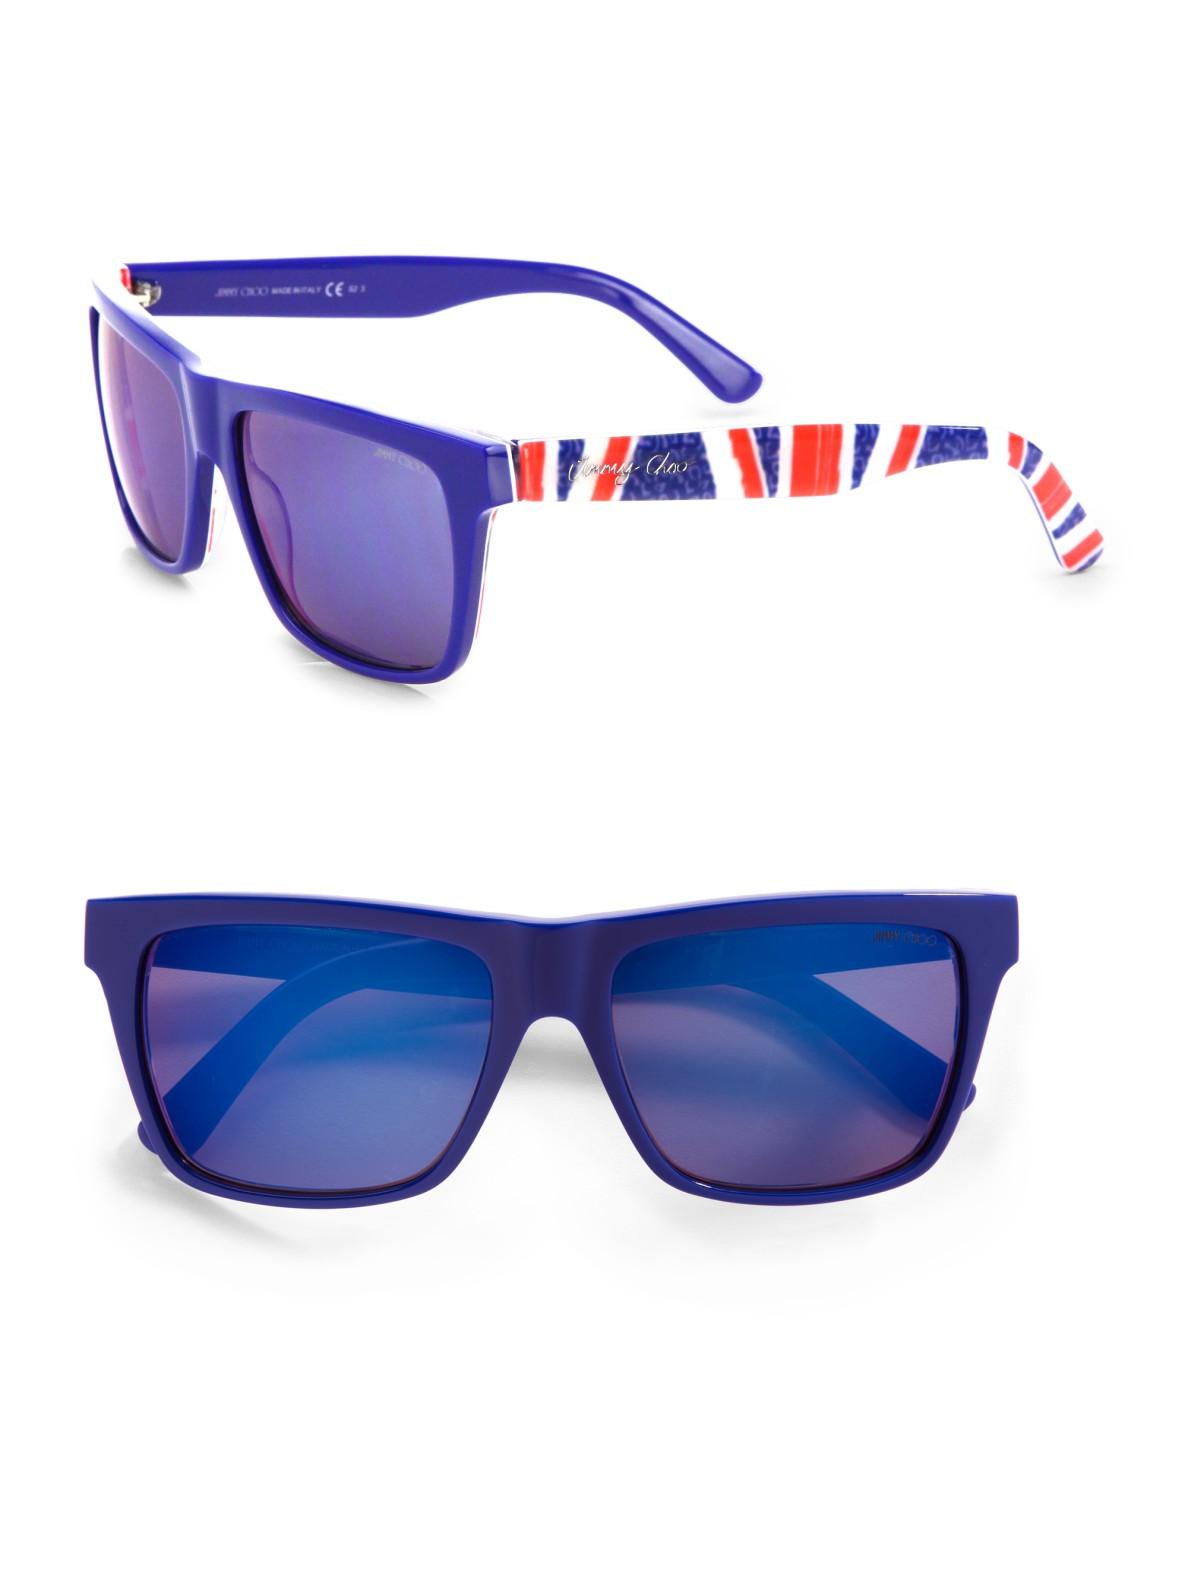 Union Jack Wayfare Sunglasses ladies size